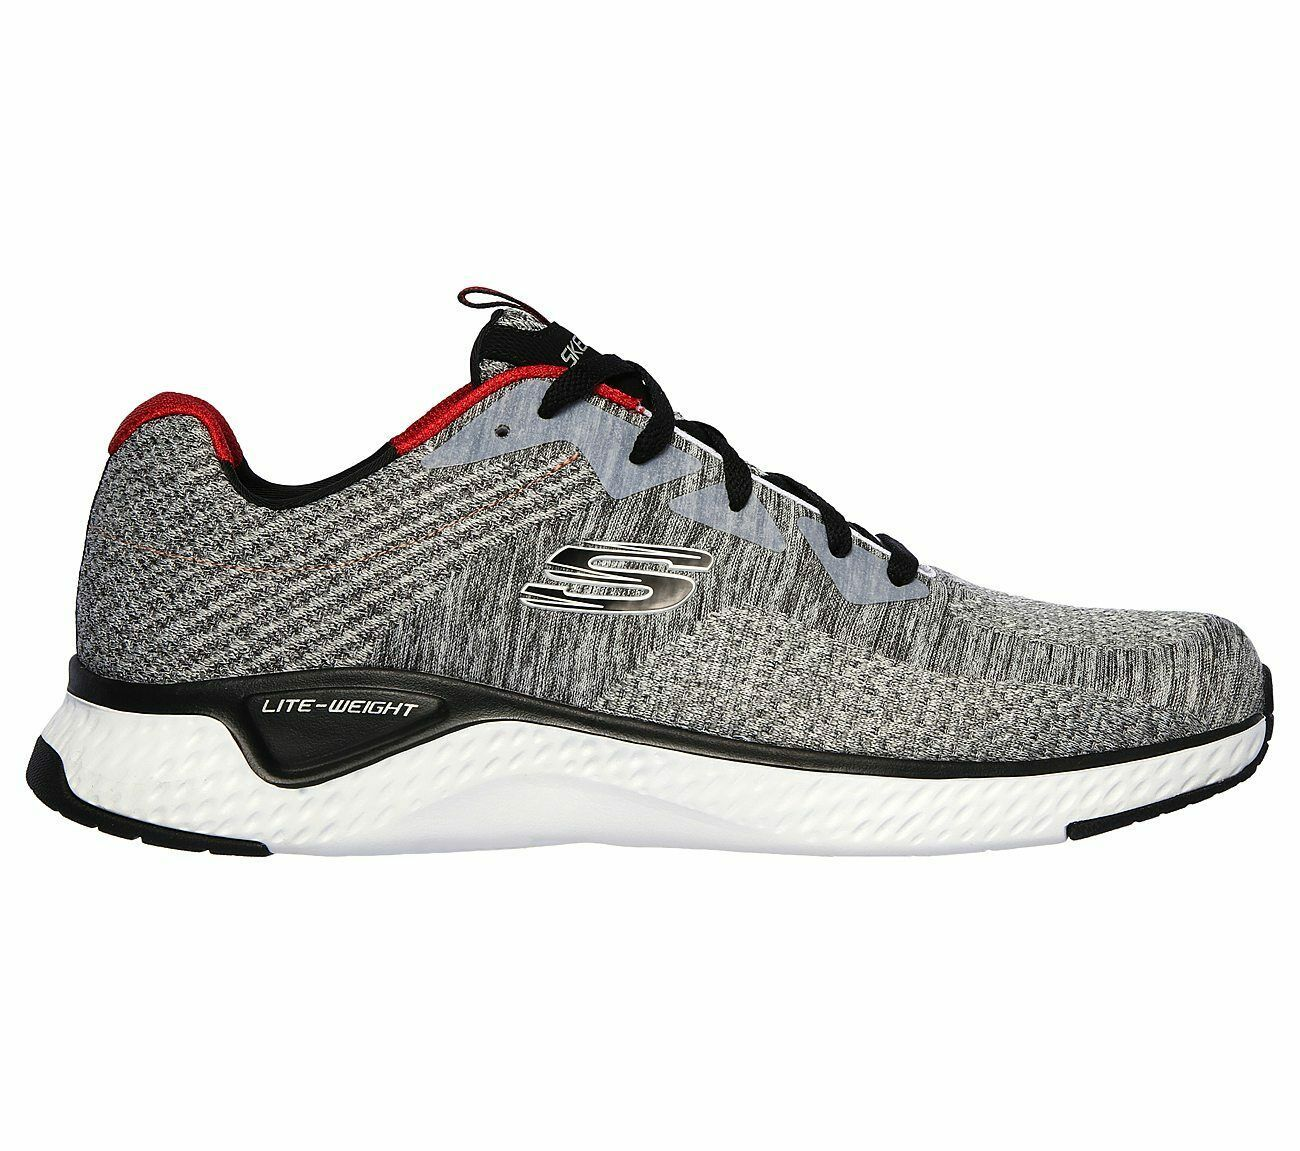 Skechers Gray shoes Men Memory Foam Walk Train Sport Comfort Casual Woven 52758 image 5